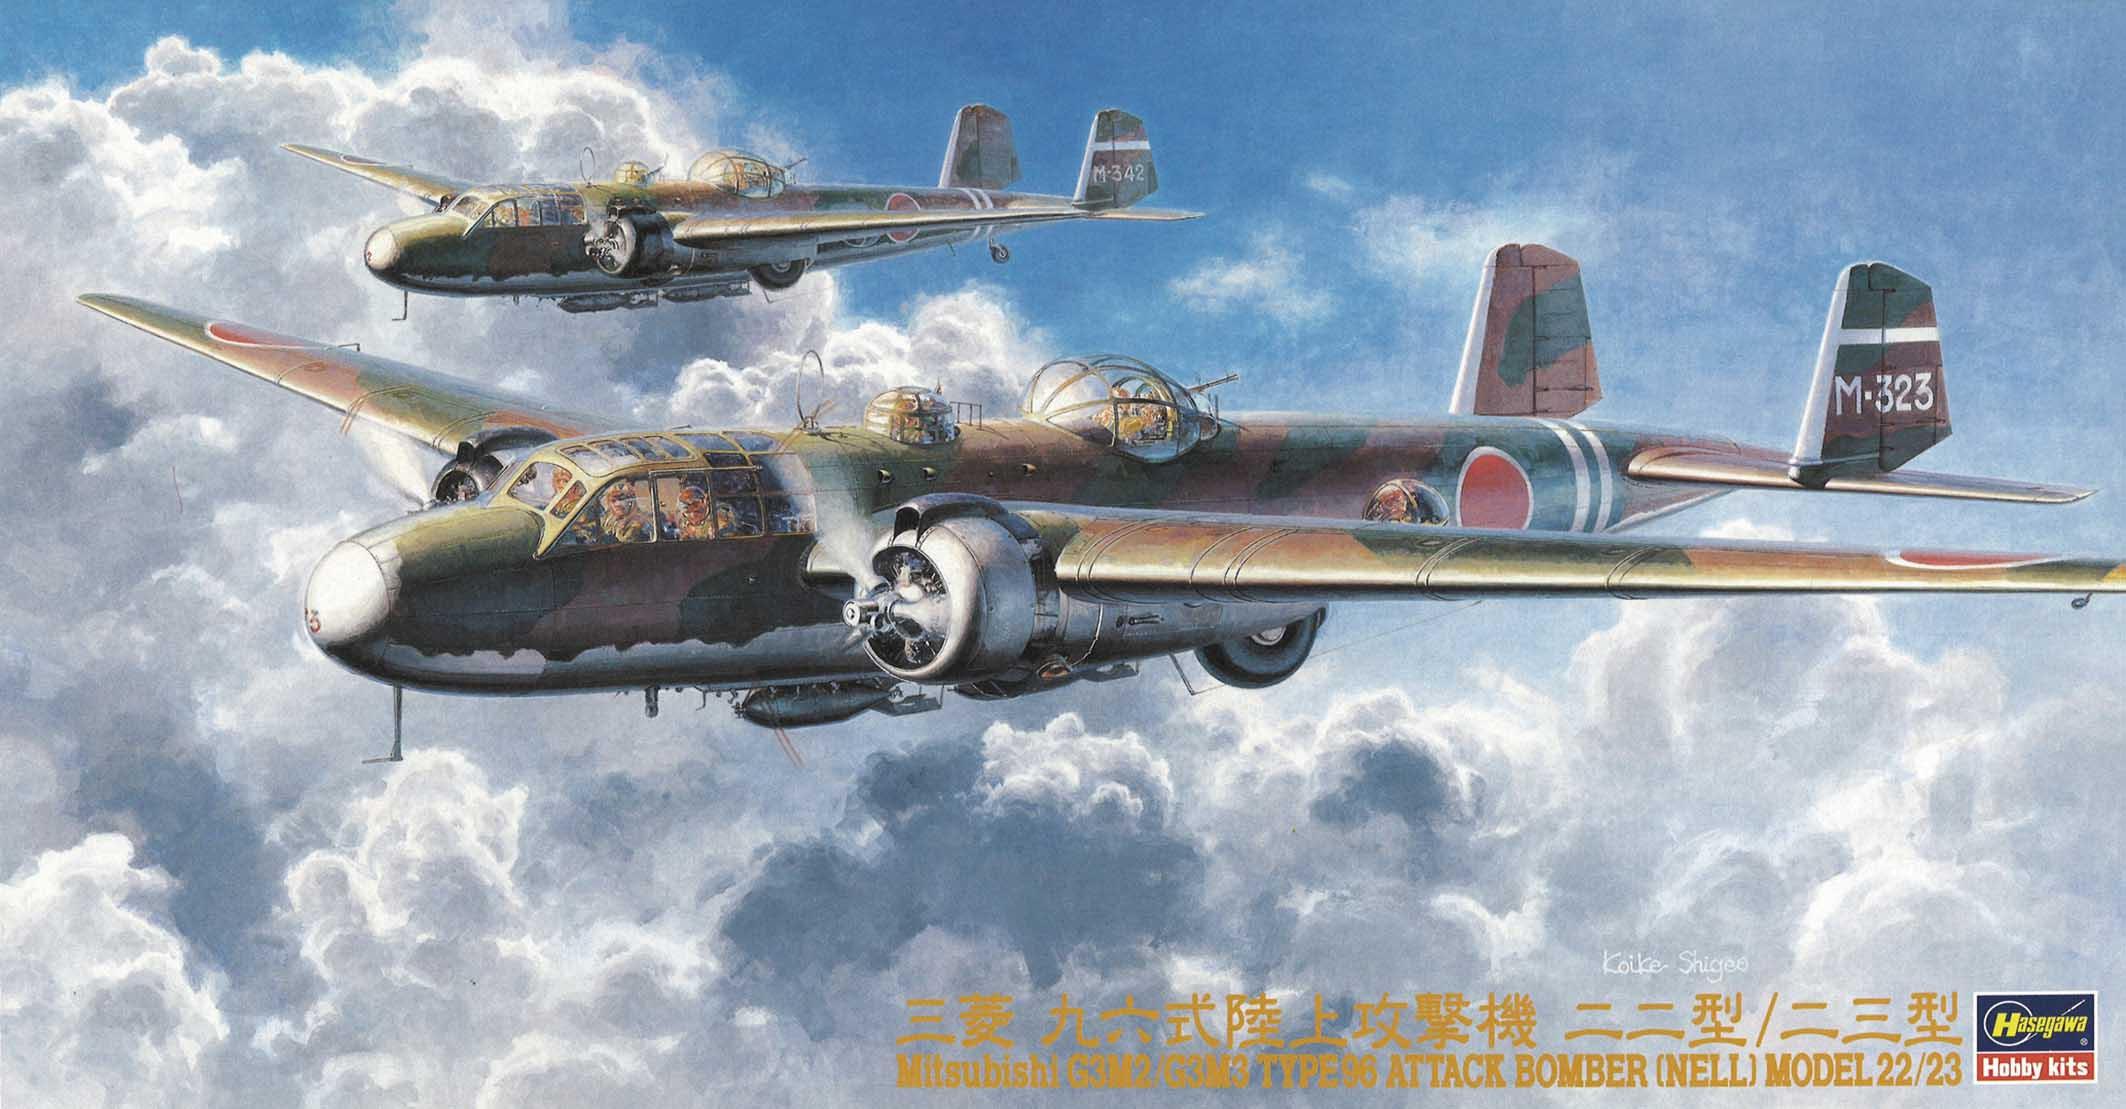 Hasegawa 1/72 Mitsubishi G3M2/G3M3 Type 96 Attack Bomber (Nell) Model 22/23